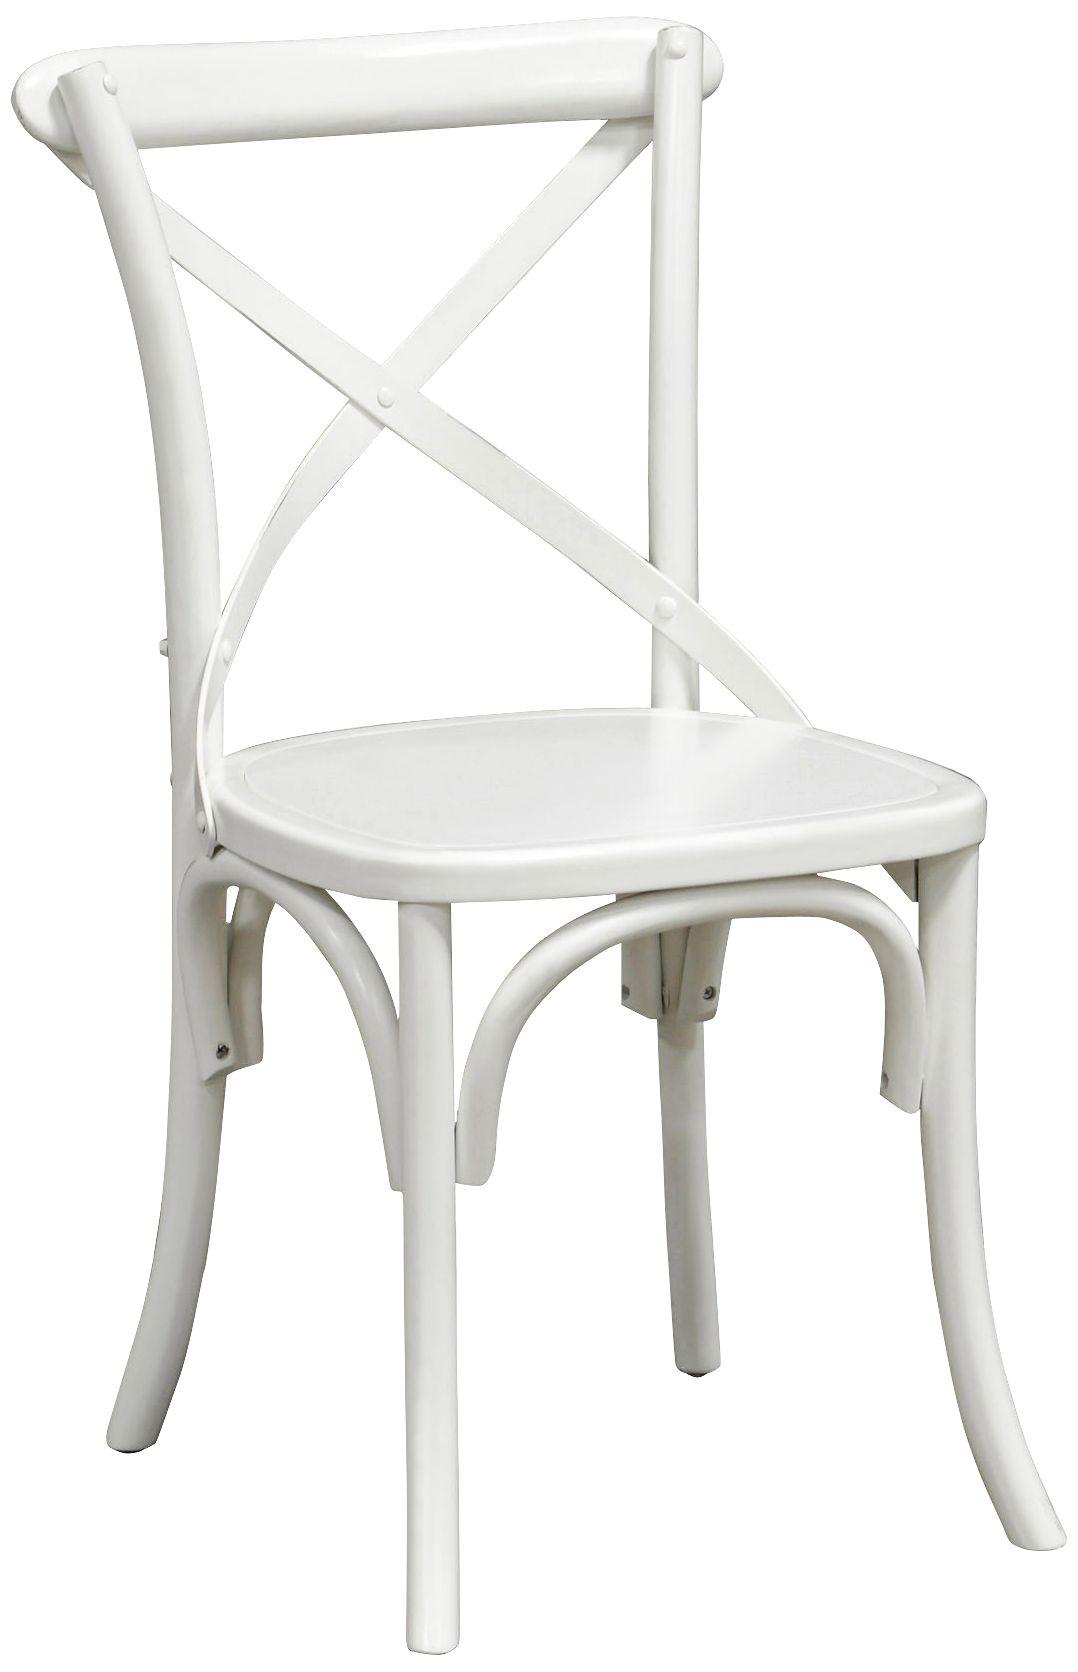 Amara Iron Cross Back Retro Pine Wood White Side Chair